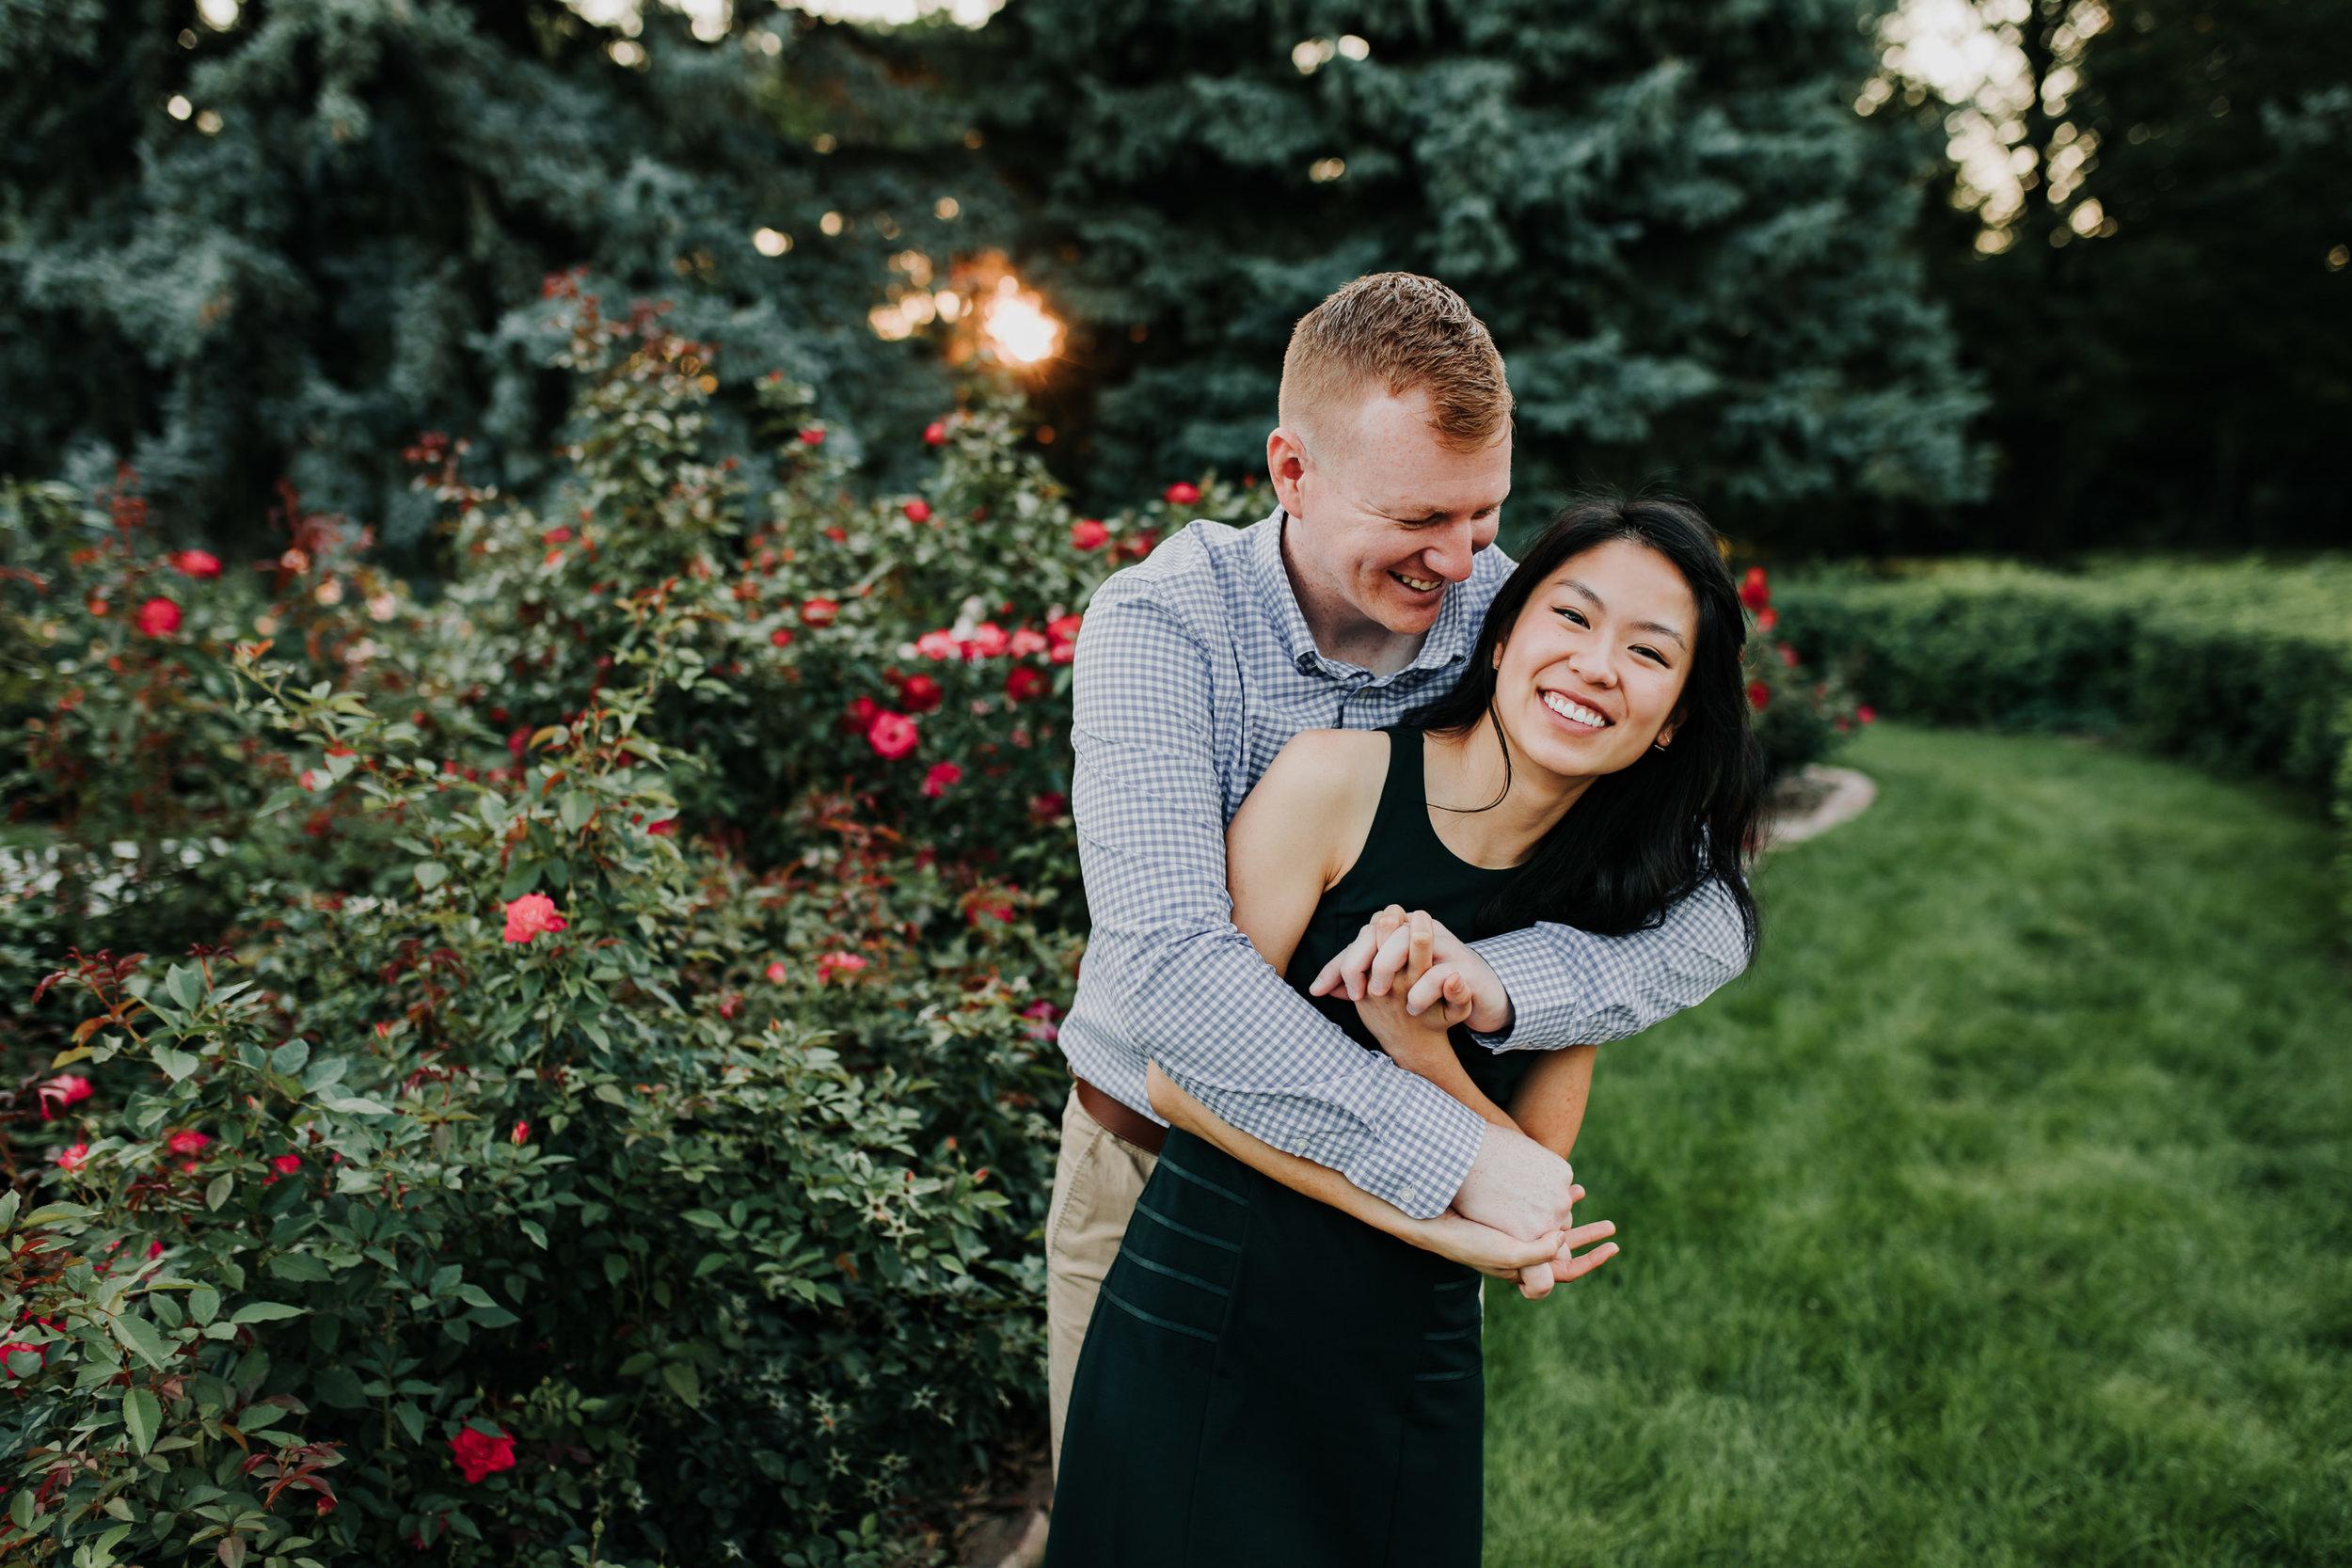 Catherin & Kyle - Married - Nathaniel Jensen Photography - Omaha Nebraska Wedding Photograper - Memorial Park - Joslyn Castle Engagement Session-63.jpg